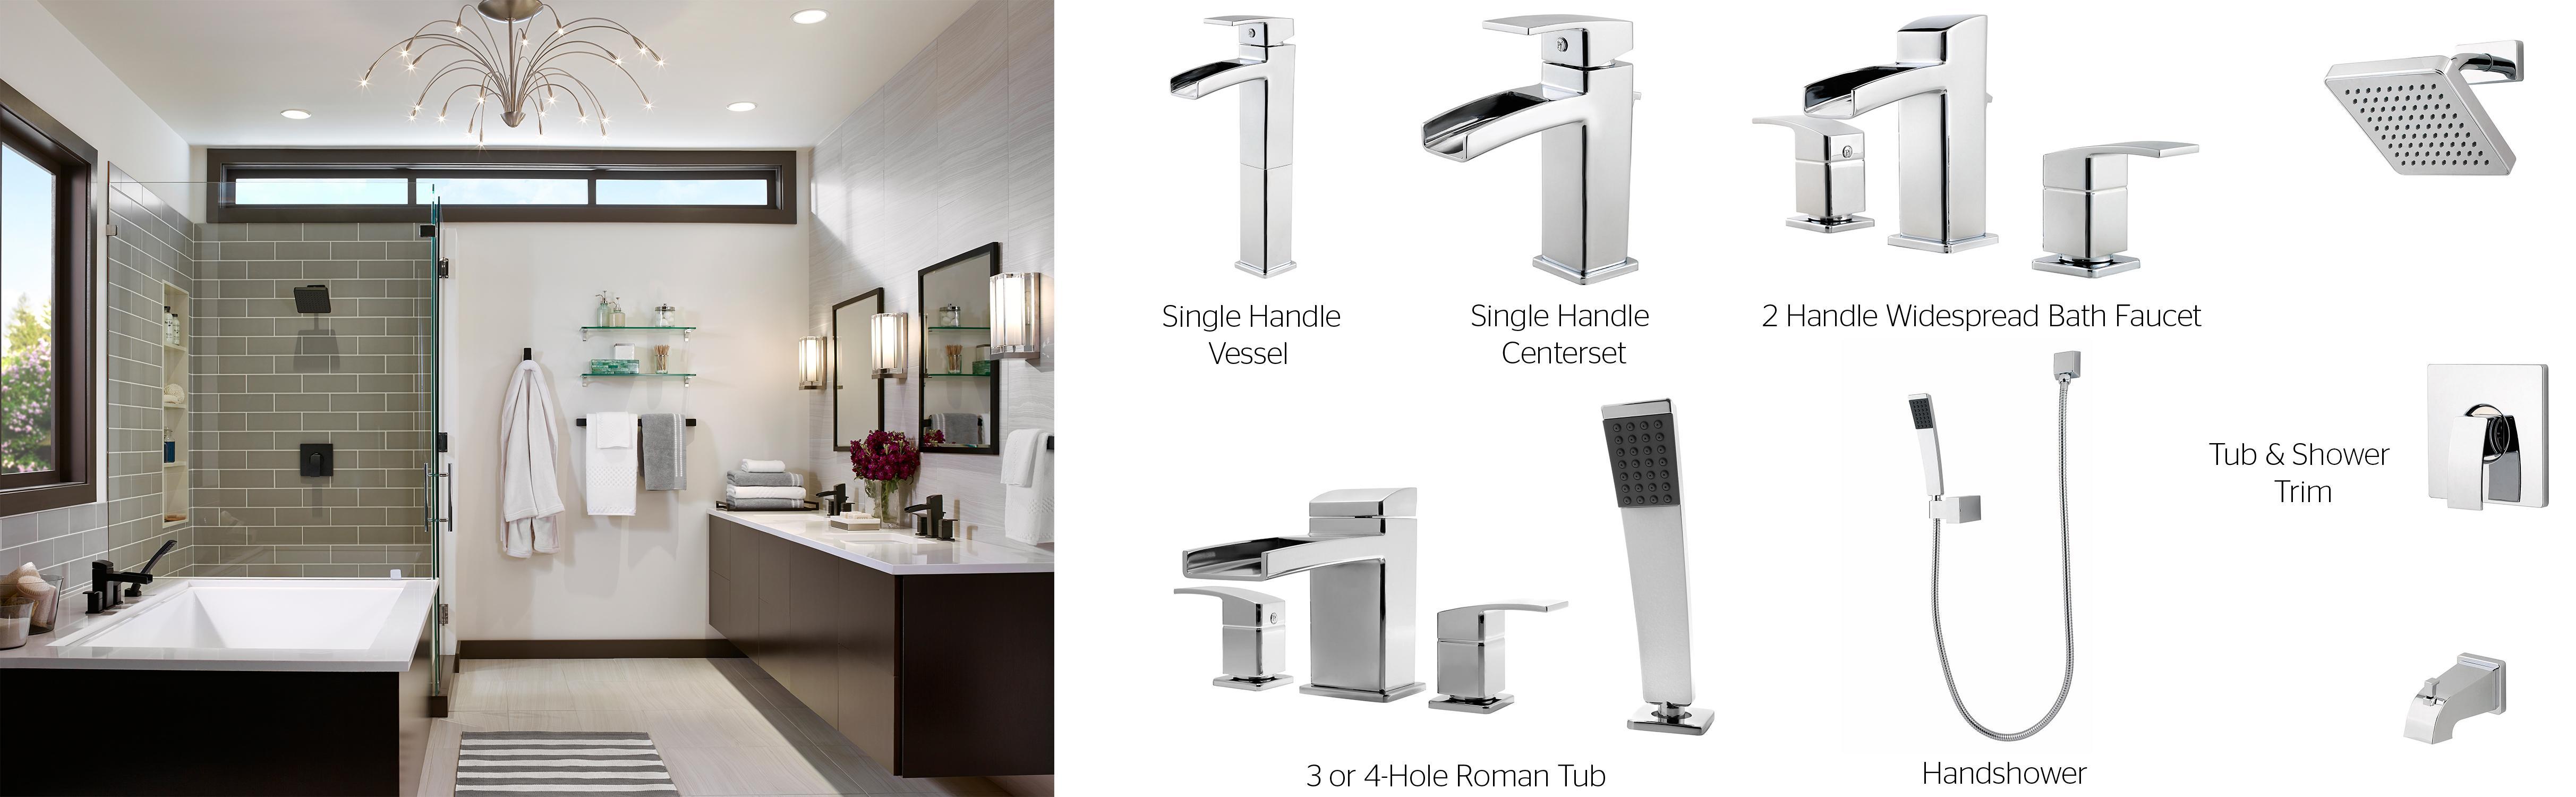 Pfister Kenzo Wall Mount 2-Handle Bathroom Faucet in Brushed Nickel GT49-DF1K